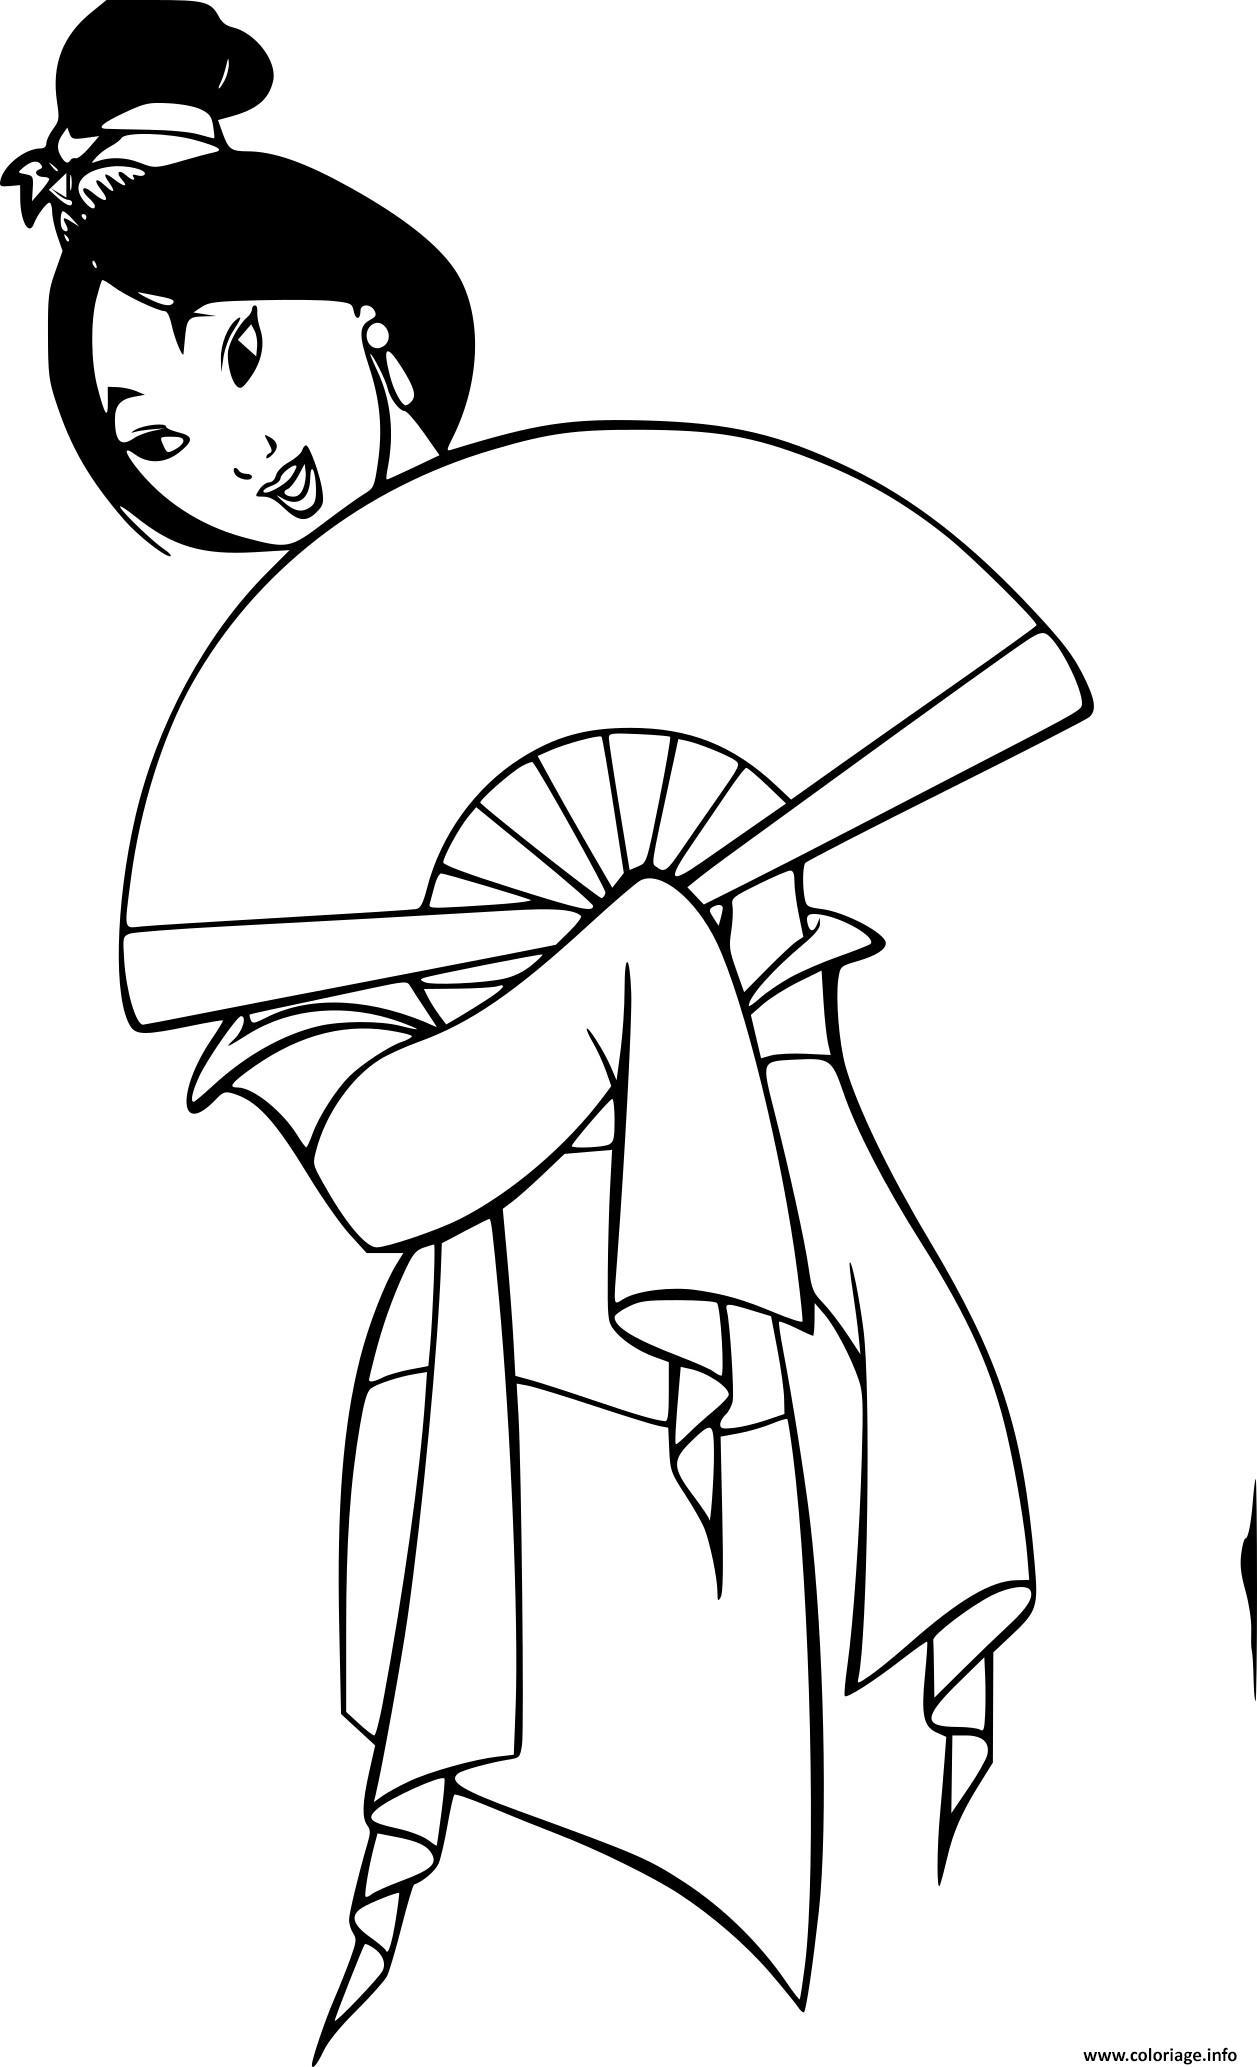 Coloriage Mulan Vetement Traditionnel Dessin Mulan A Imprimer